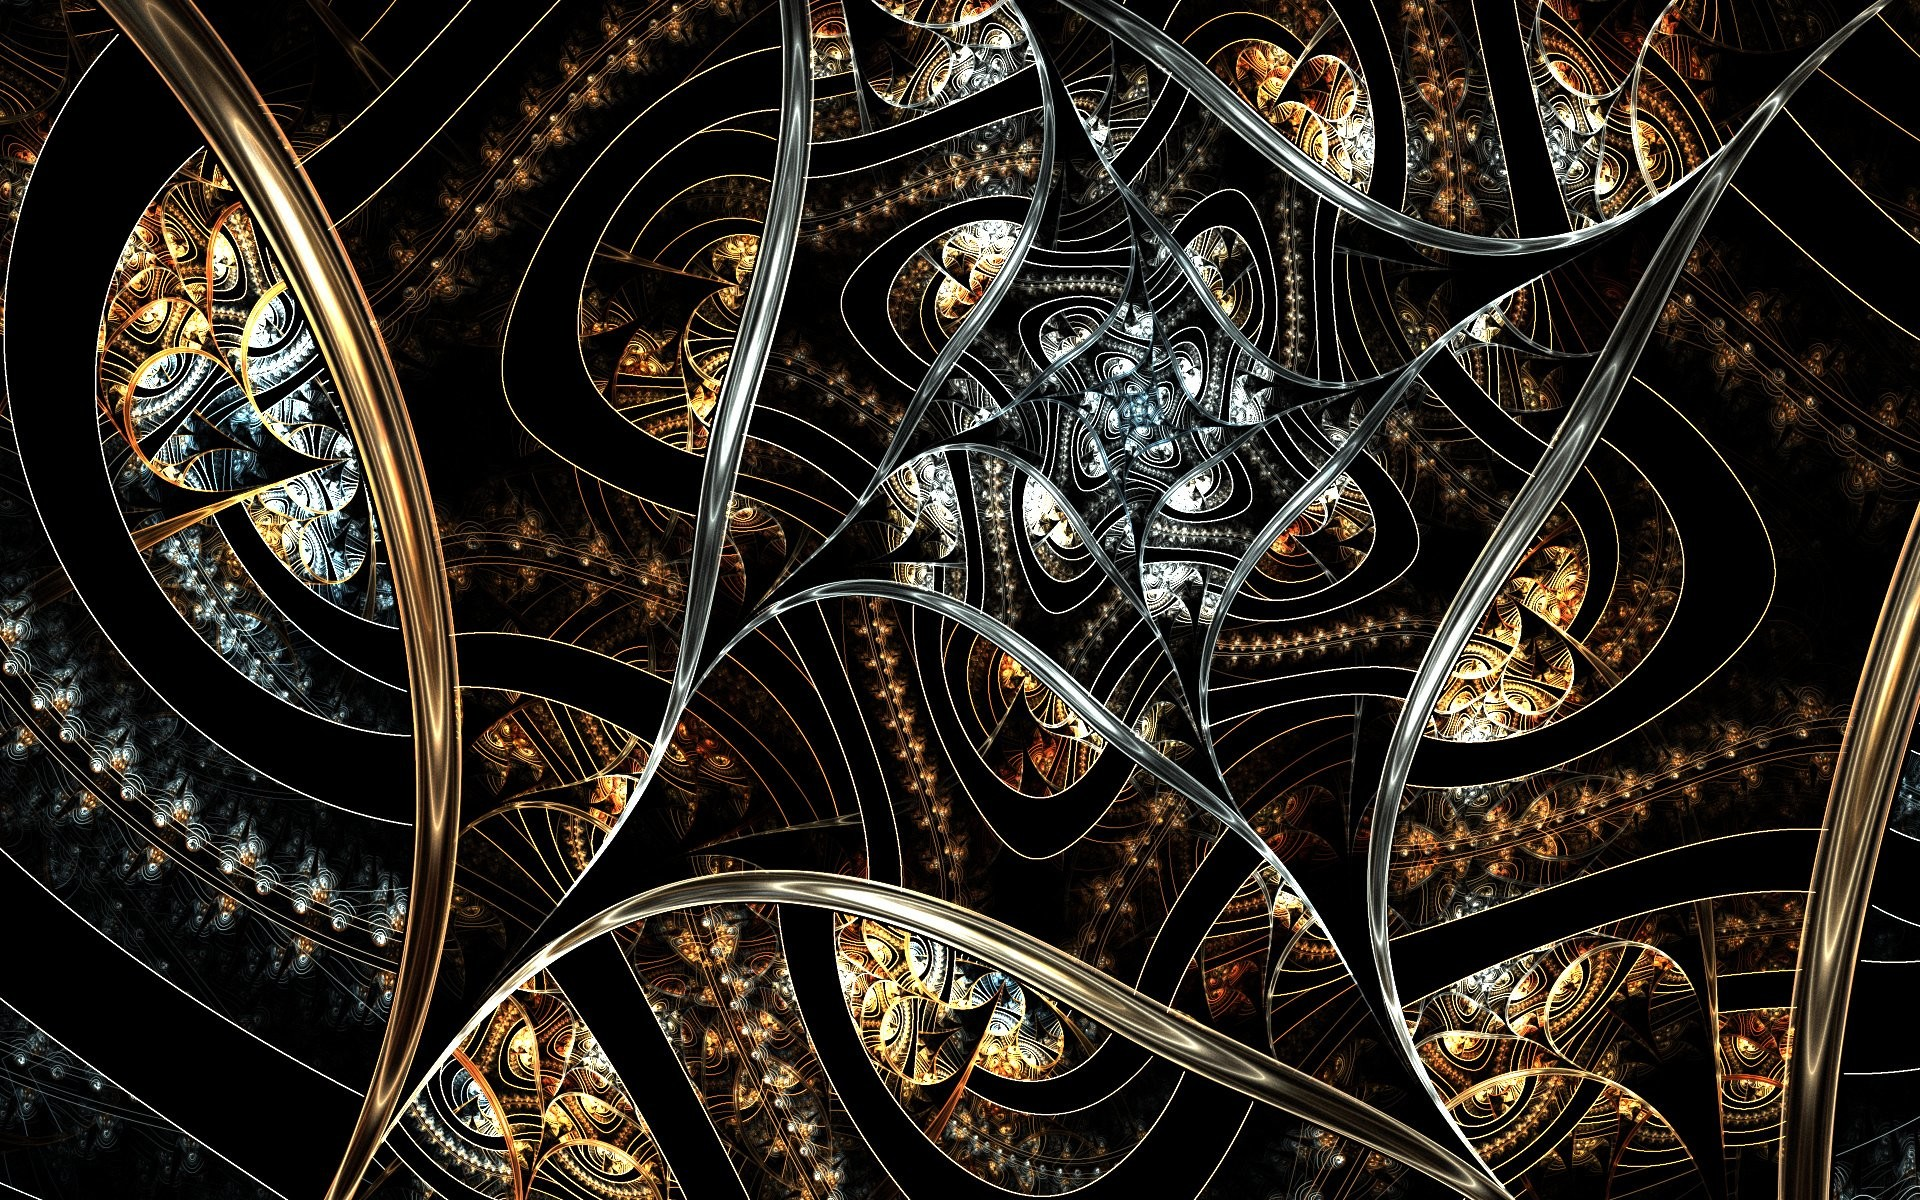 fractal wallpaper 1080p hd – photo #11